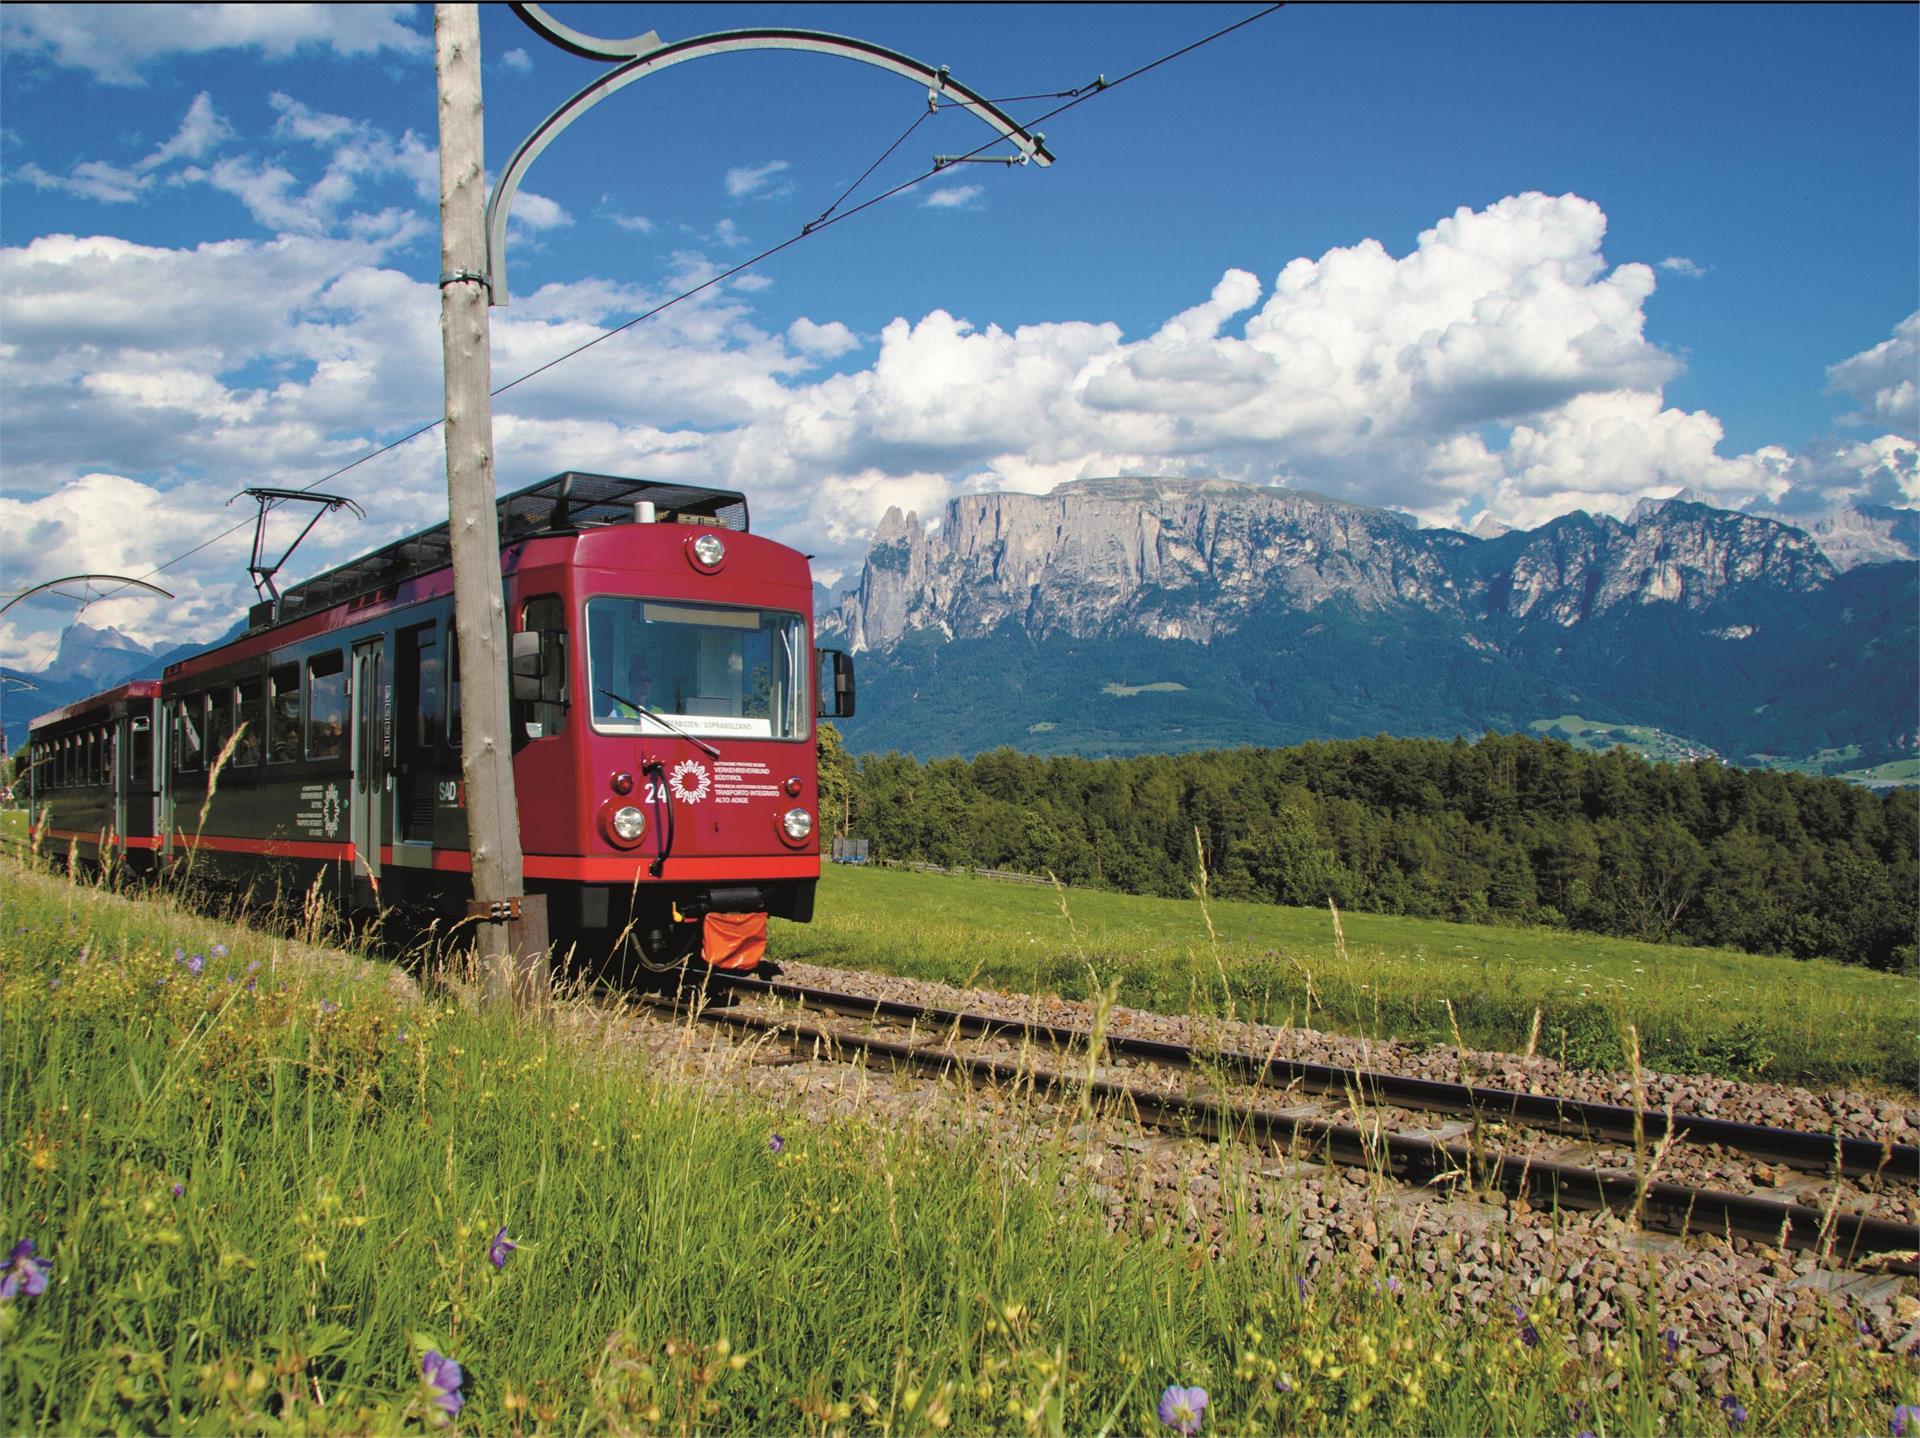 Railway Renon